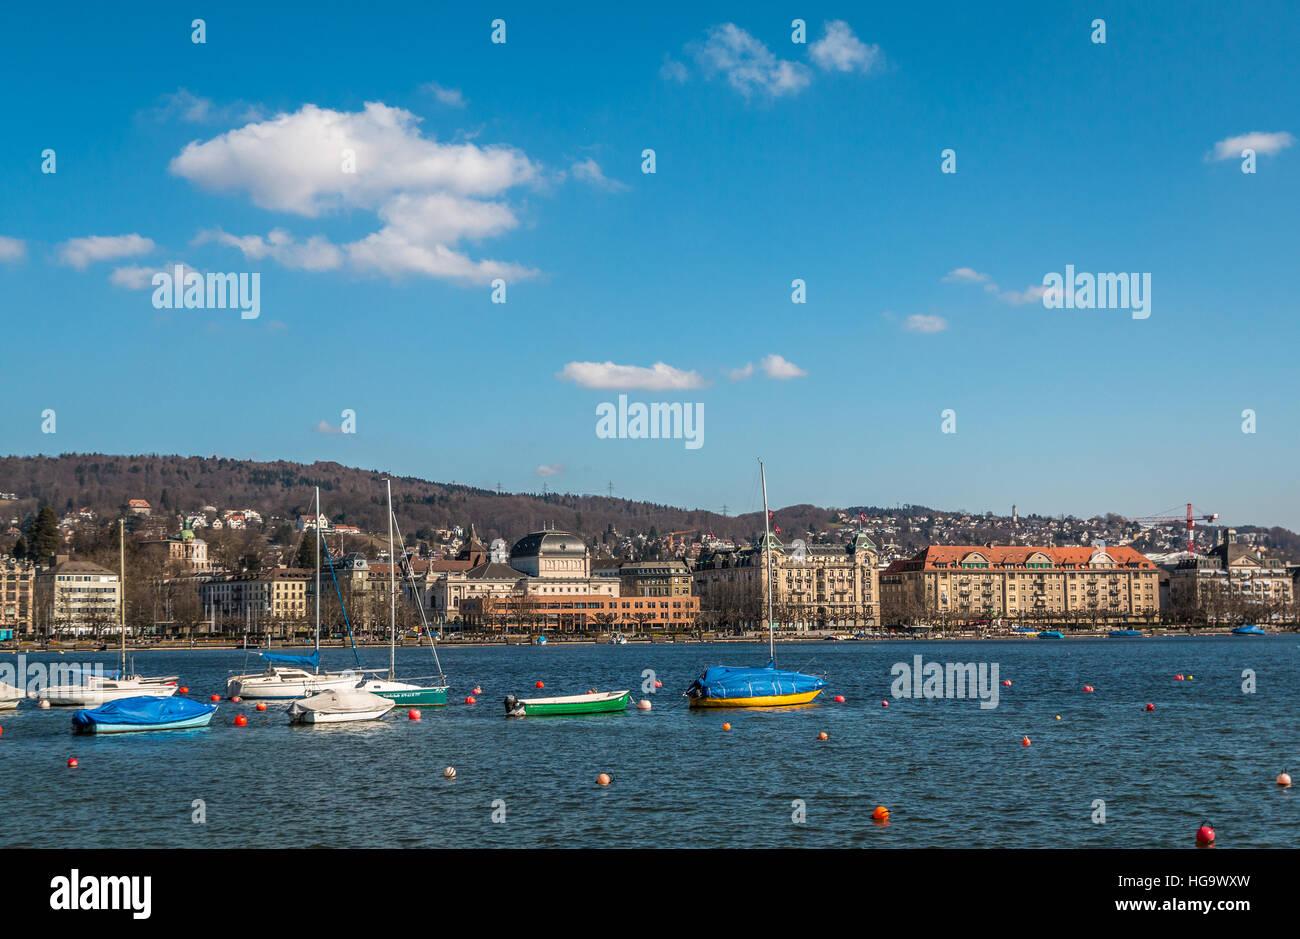 Lake Zurich view - Stock Image